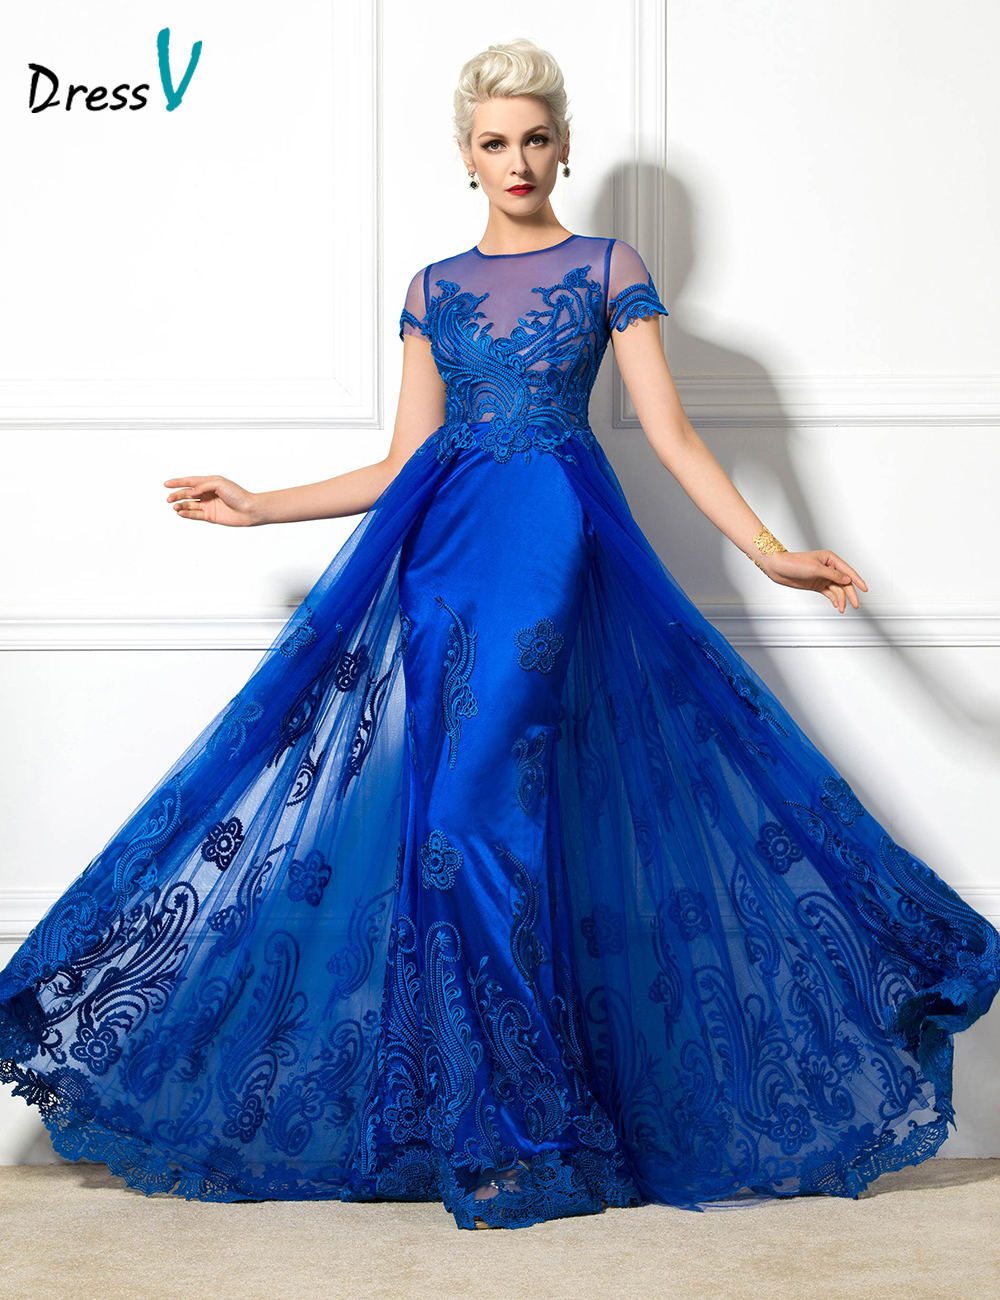 Dressv 2016 Jewel Neck Short Sleeve A-Line evening dress Appliques long elegant sexy lace up party girls Evening Dress(China (Mainland))